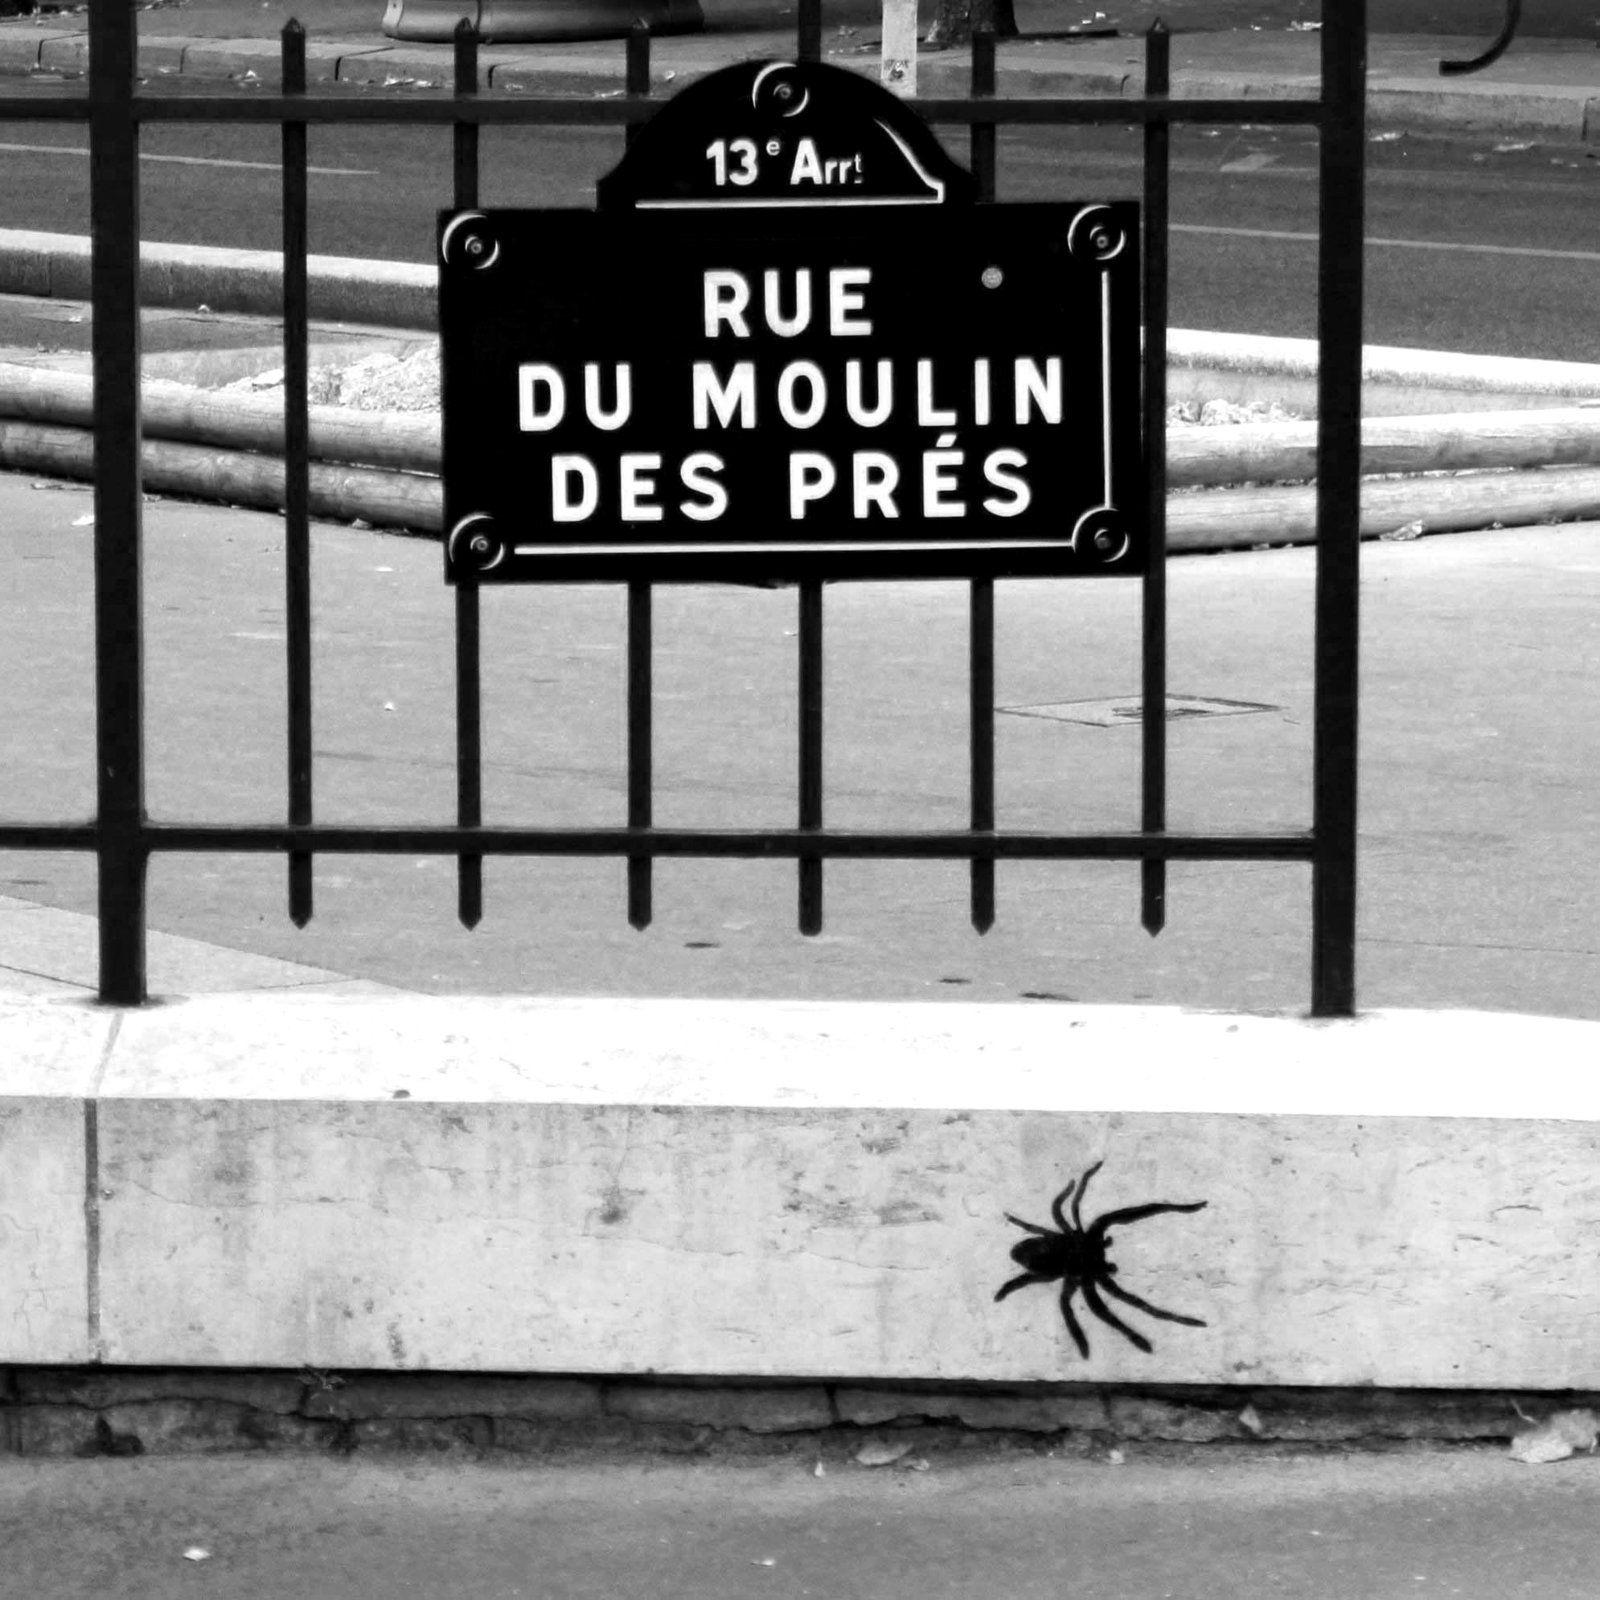 Paris - Vendredi 24 juillet 2020